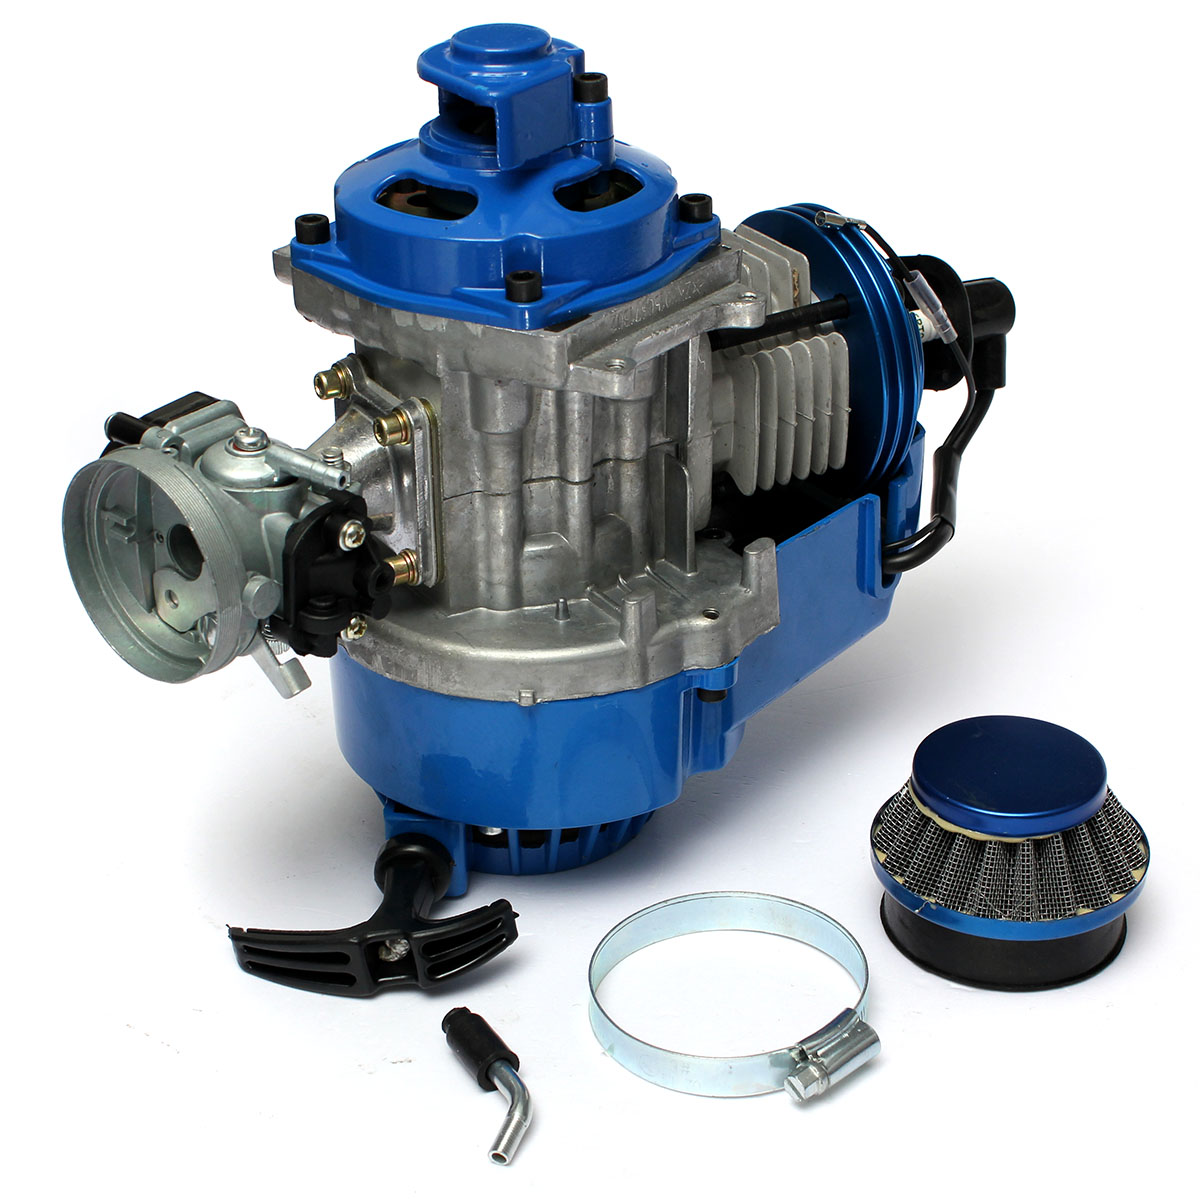 MATCC Air Cooled 49cc Racing Engine Start 2 Stroke Motor ...